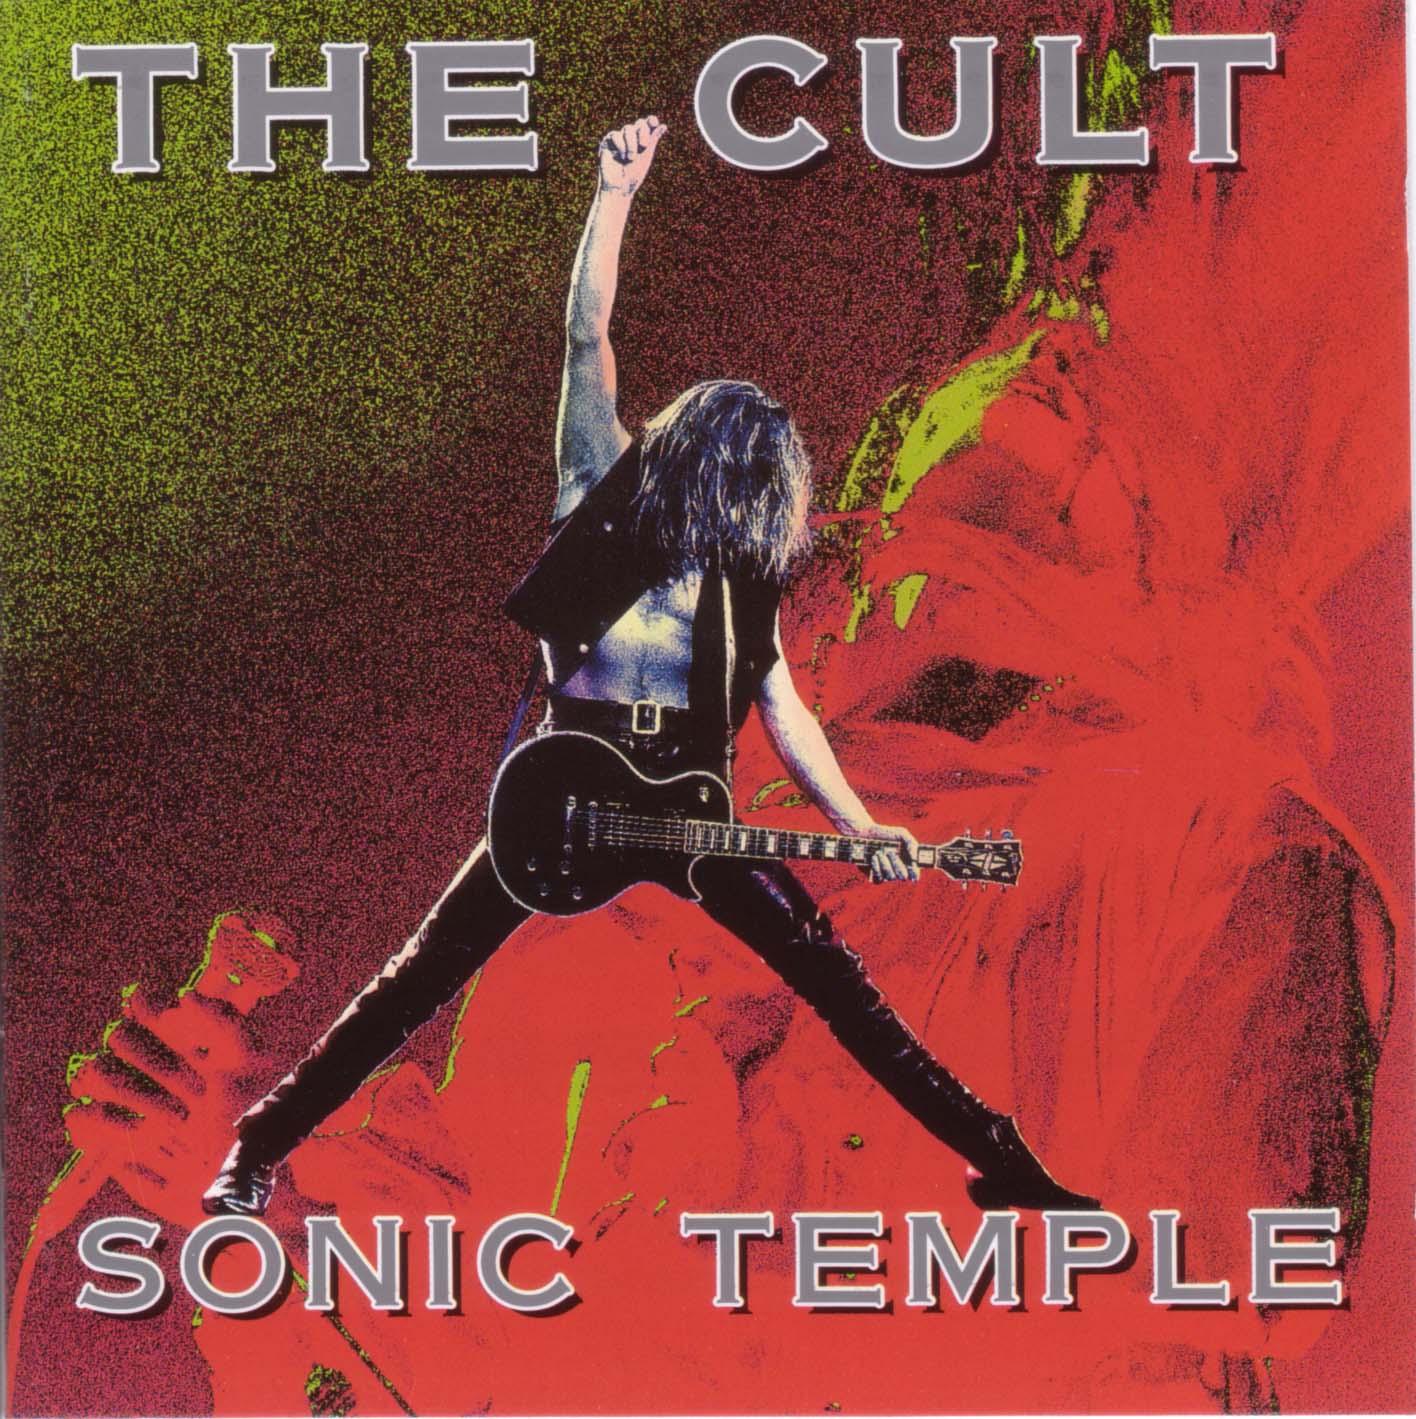 http://2.bp.blogspot.com/_k0QMvM_eyus/TGs5ps0i0tI/AAAAAAAABao/1Uev_RCwuoM/s1600/the_cult-sonic_temple-frontal.jpg